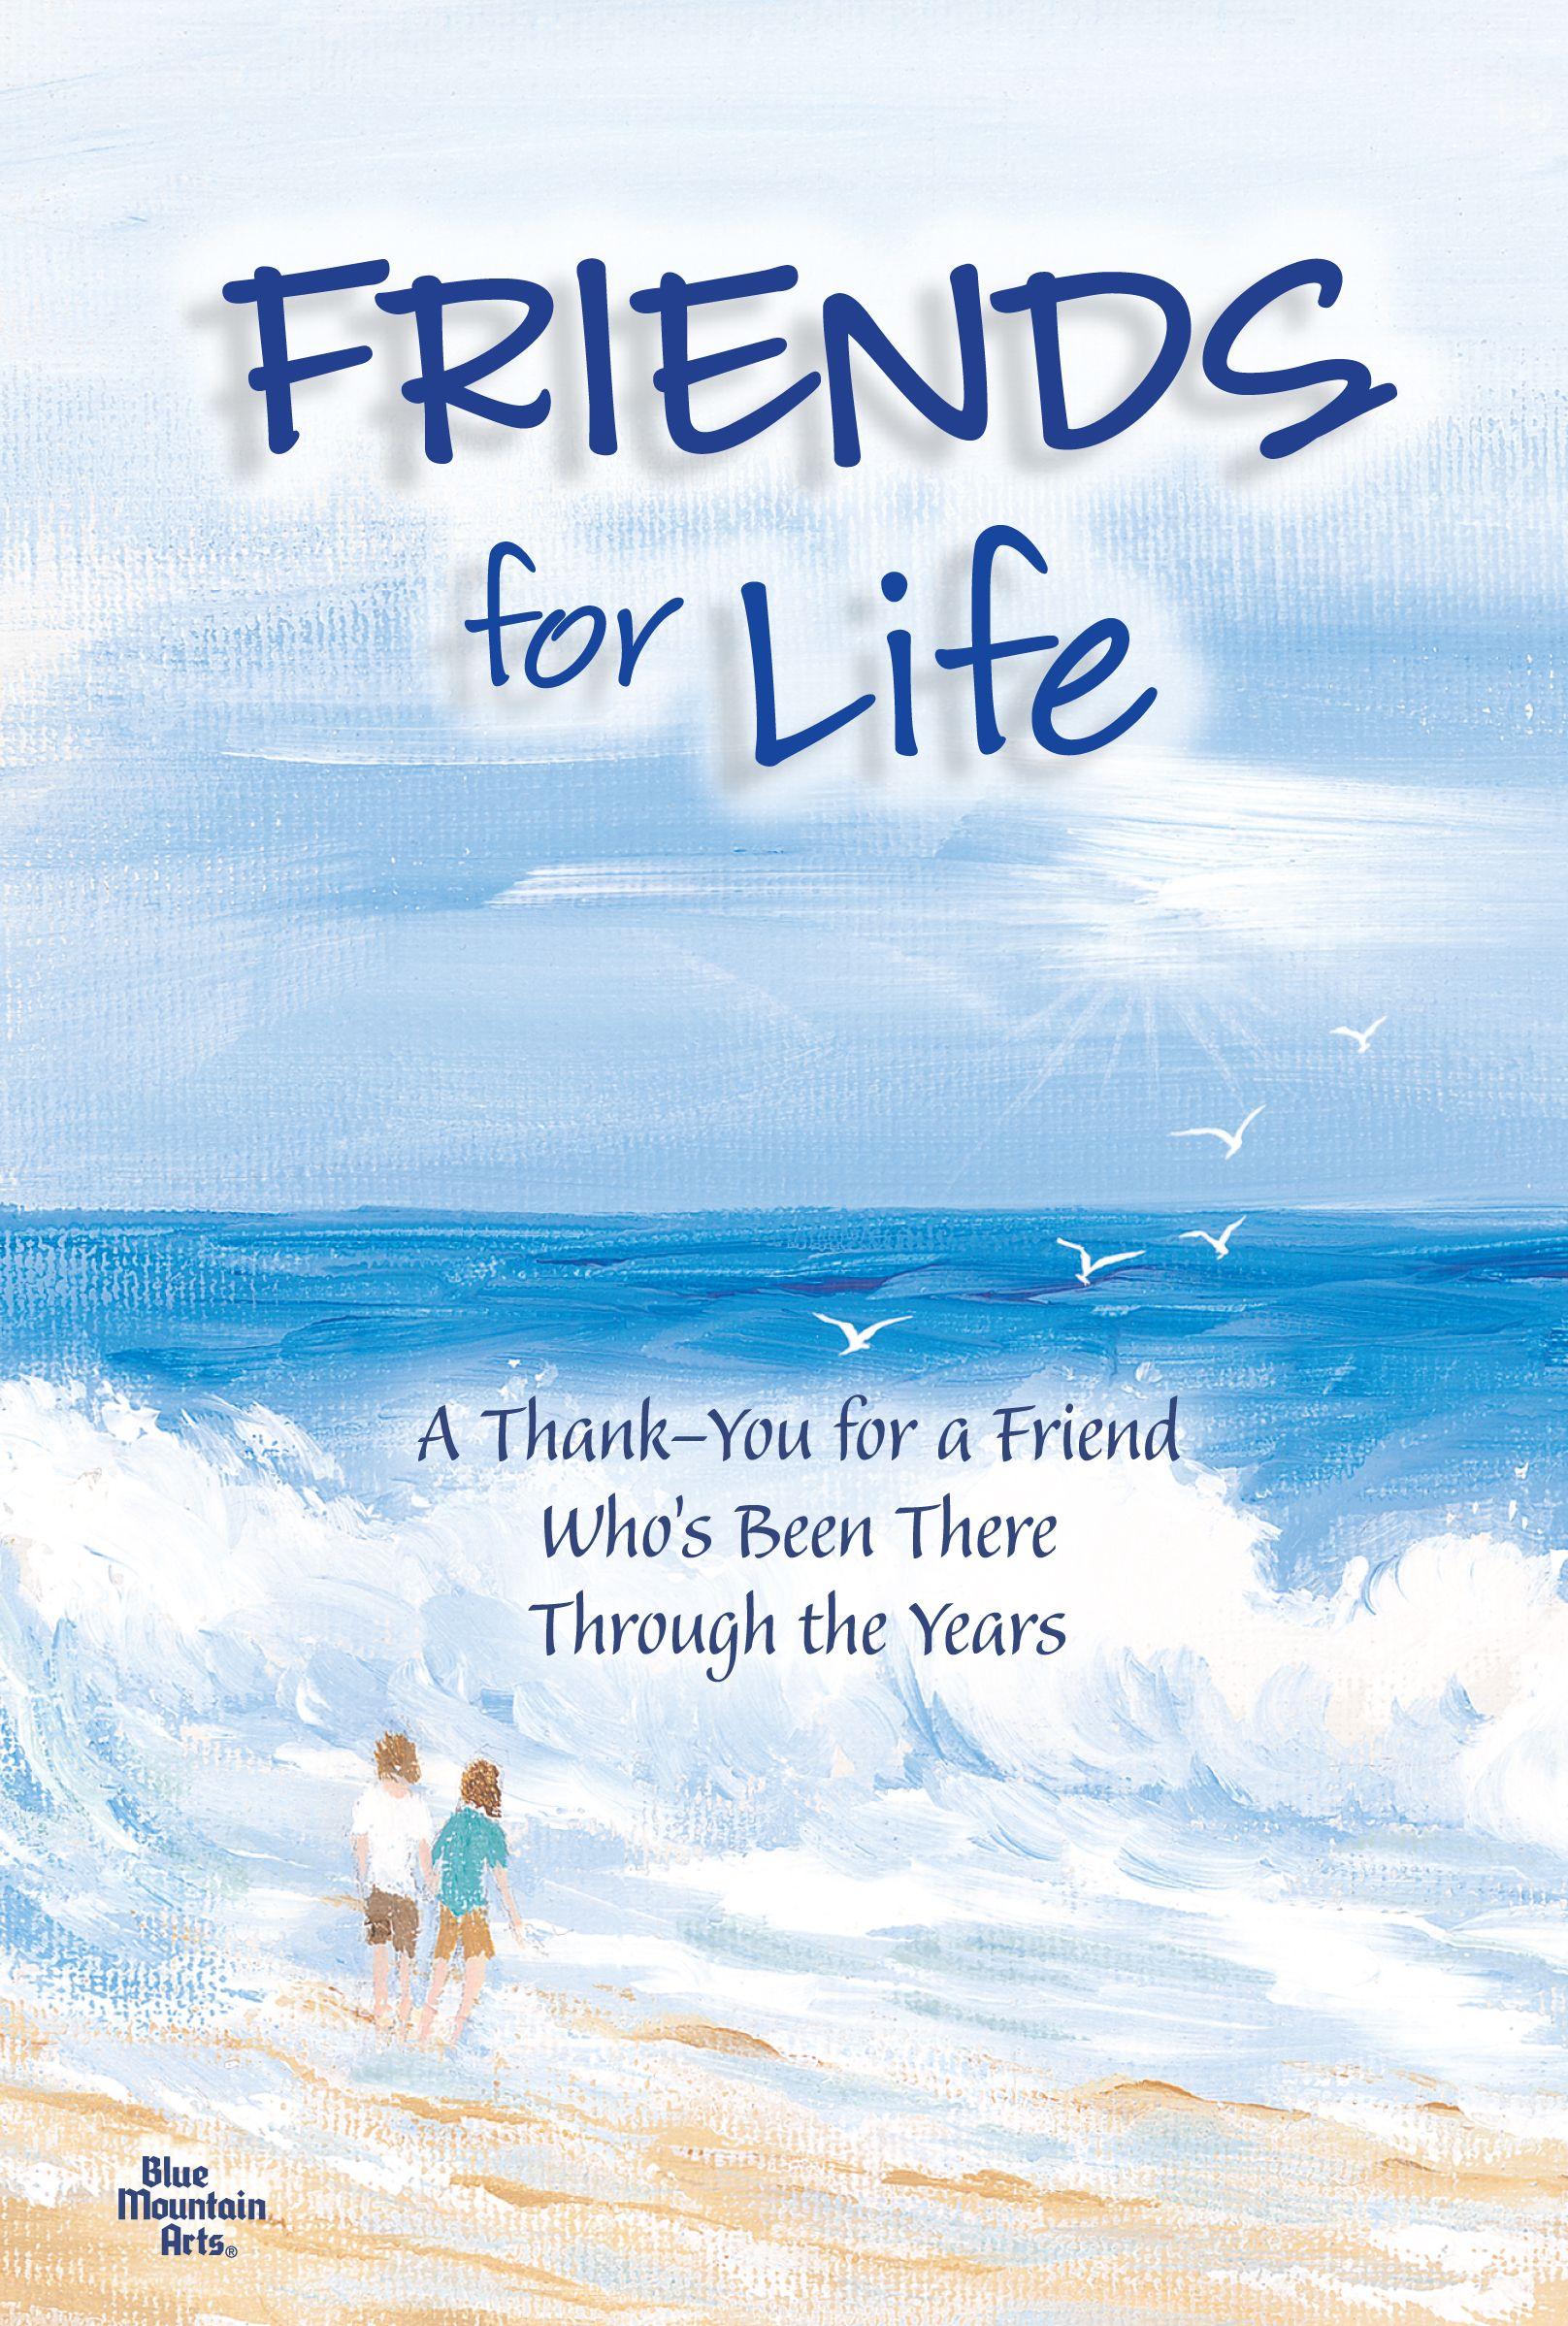 Lifelong friends share a special bond. Friends for Life